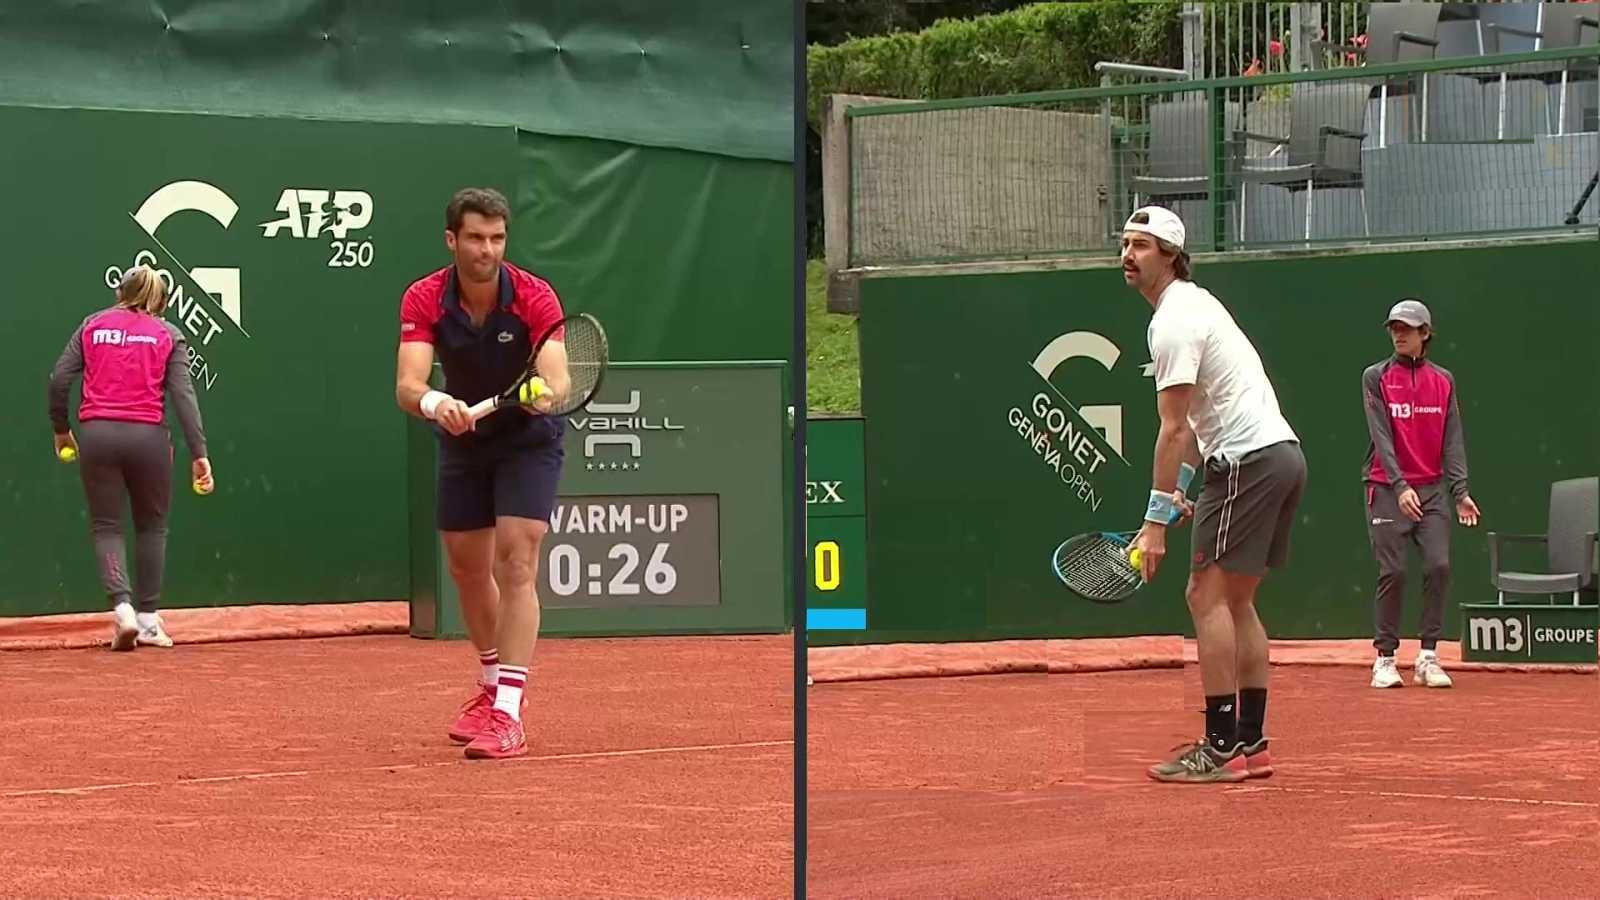 Tenis - ATP 250 Torneo Ginebra: Jordan Thompson - Pablo Andujar - ver ahora